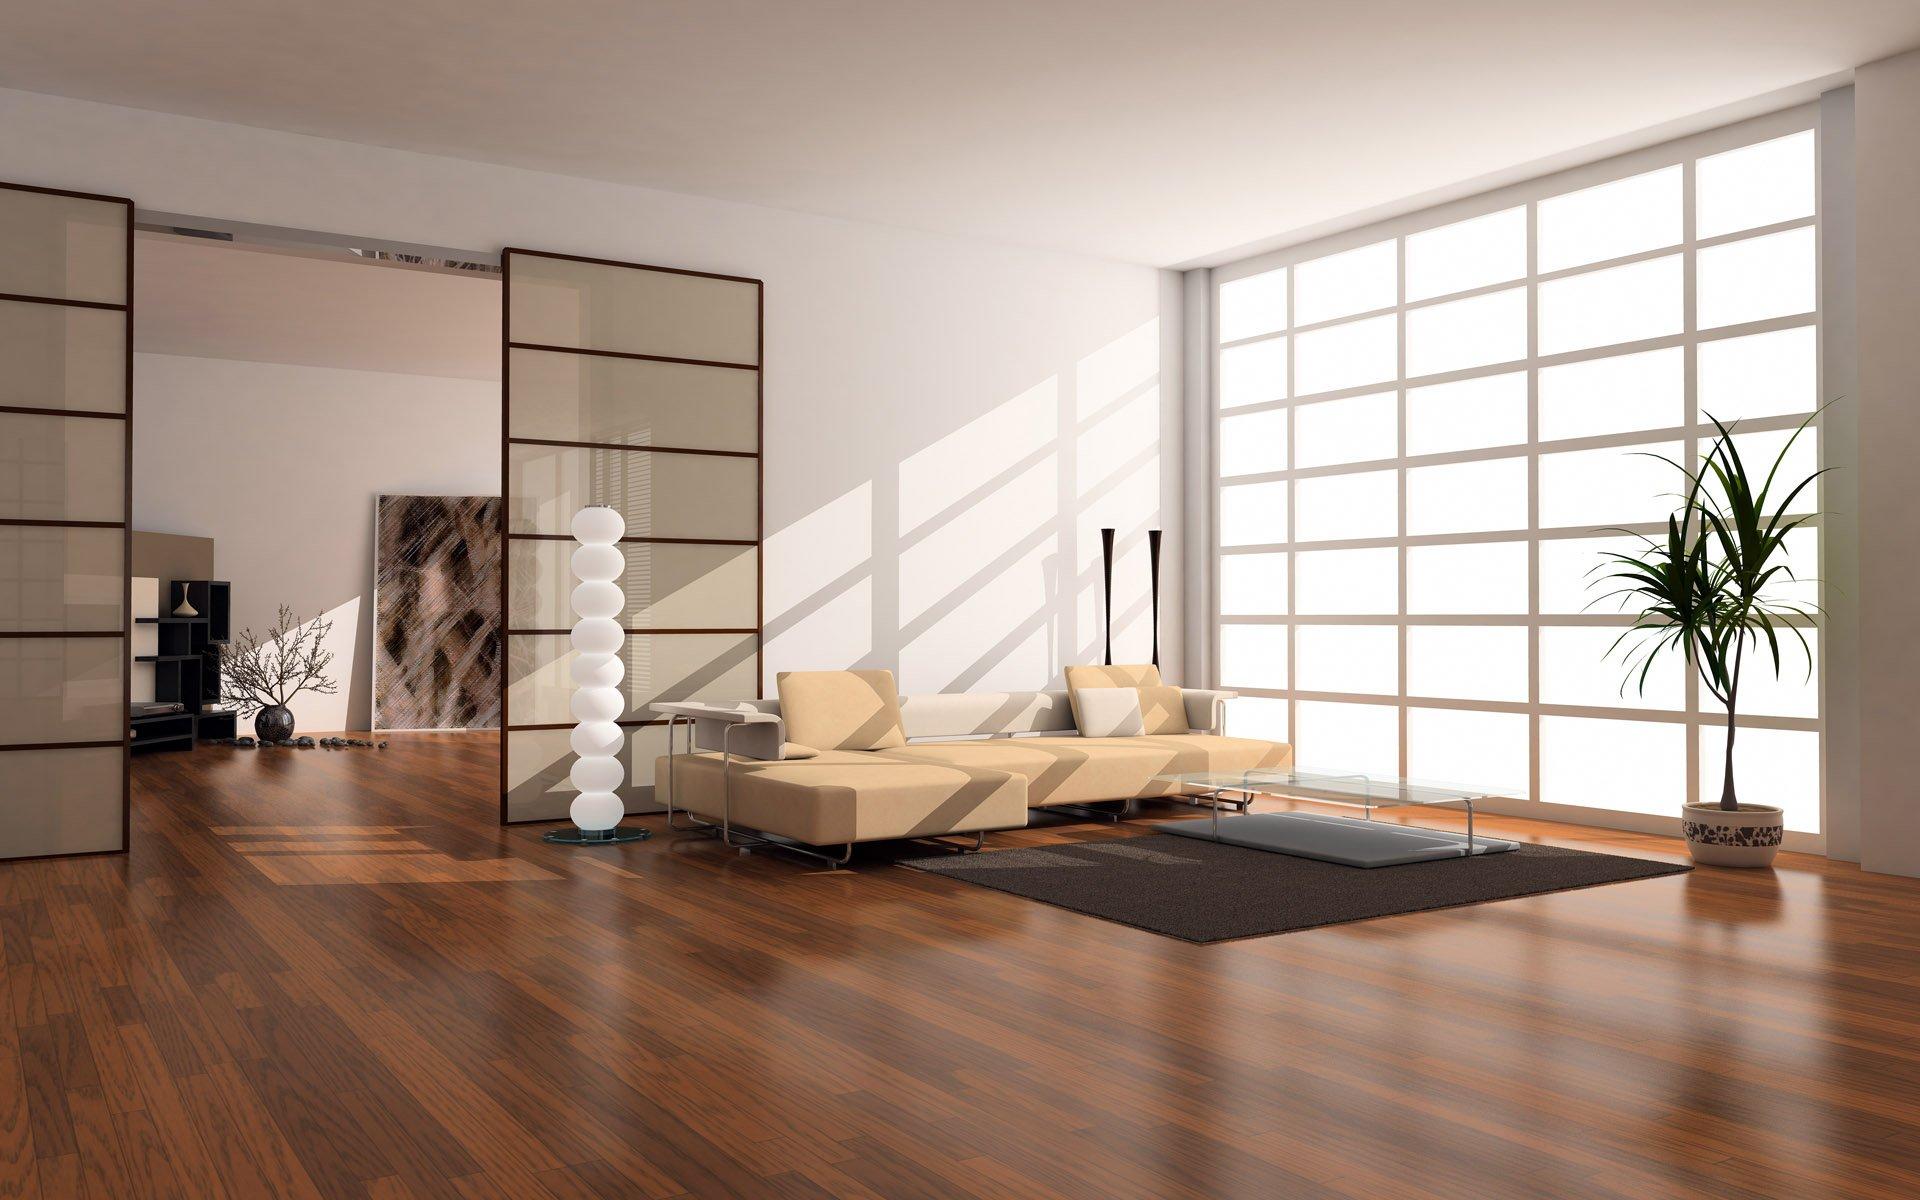 Interior design room house home apartment condo 240 wallpaper